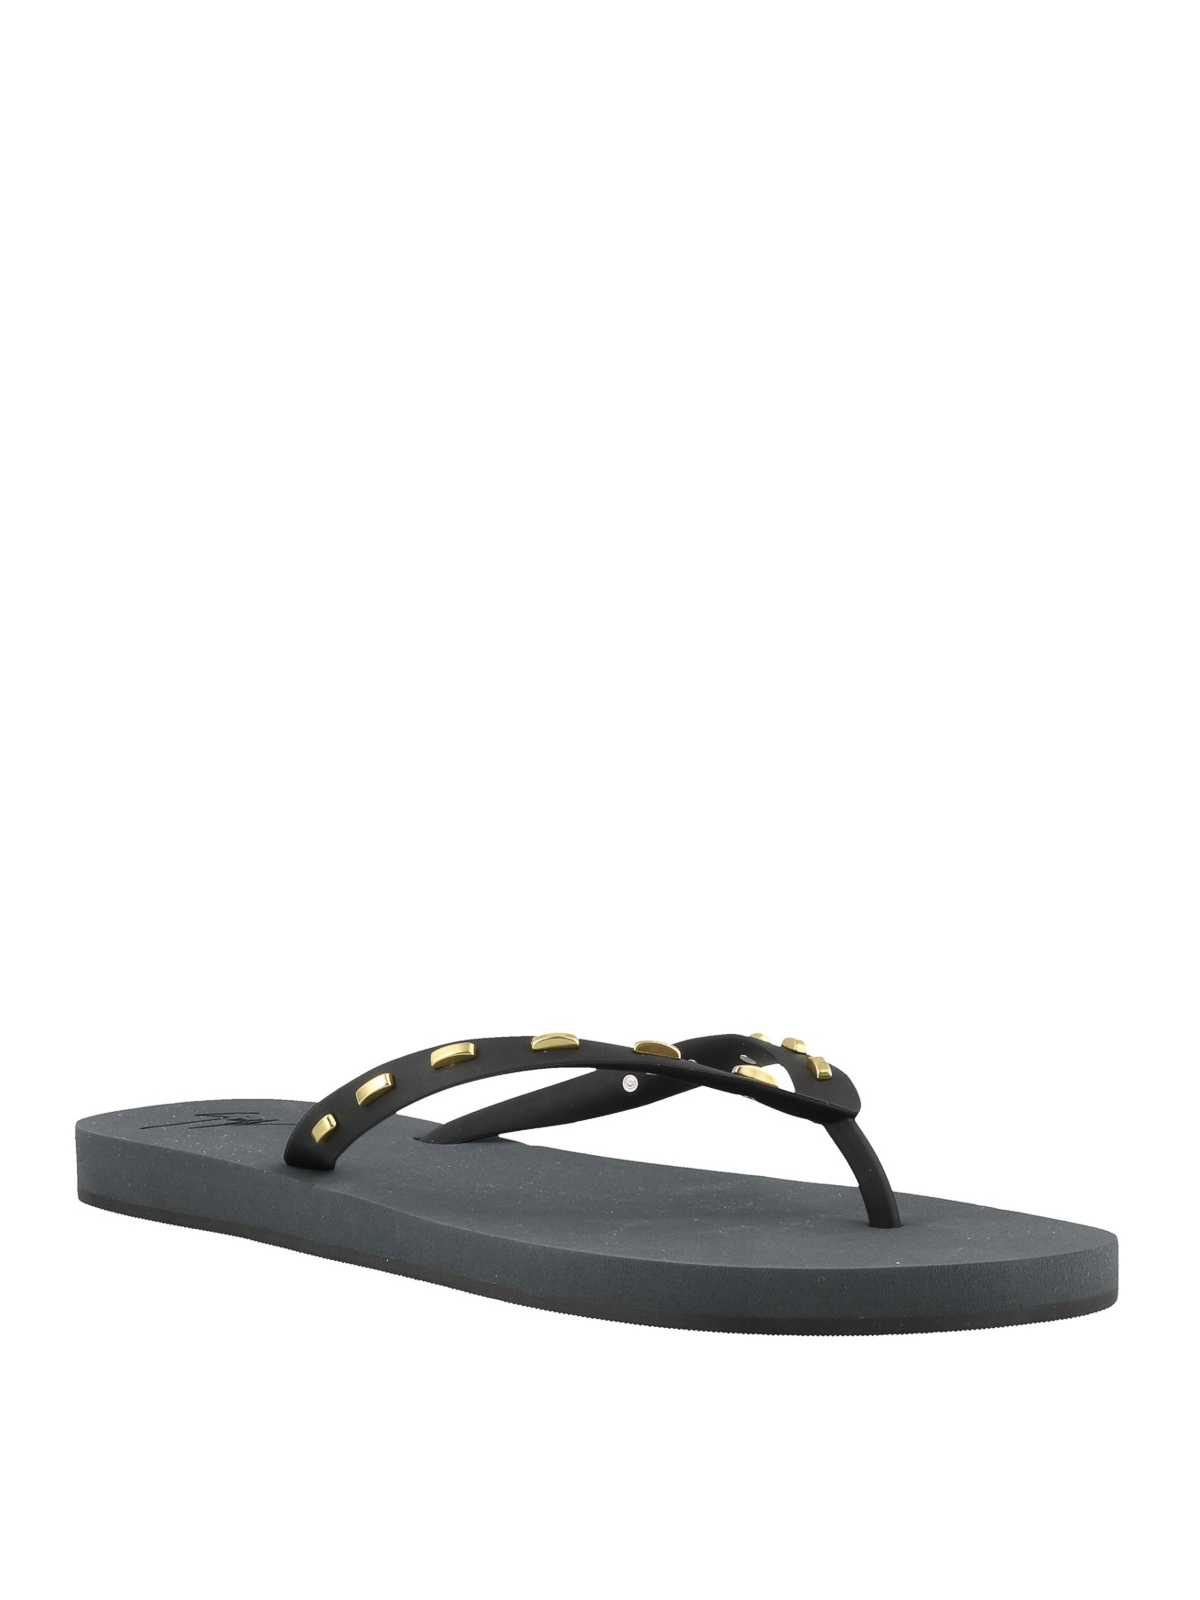 b19f9c35c108 GIUSEPPE ZANOTTI  flip flops online - Black and gold rubber thong sandals